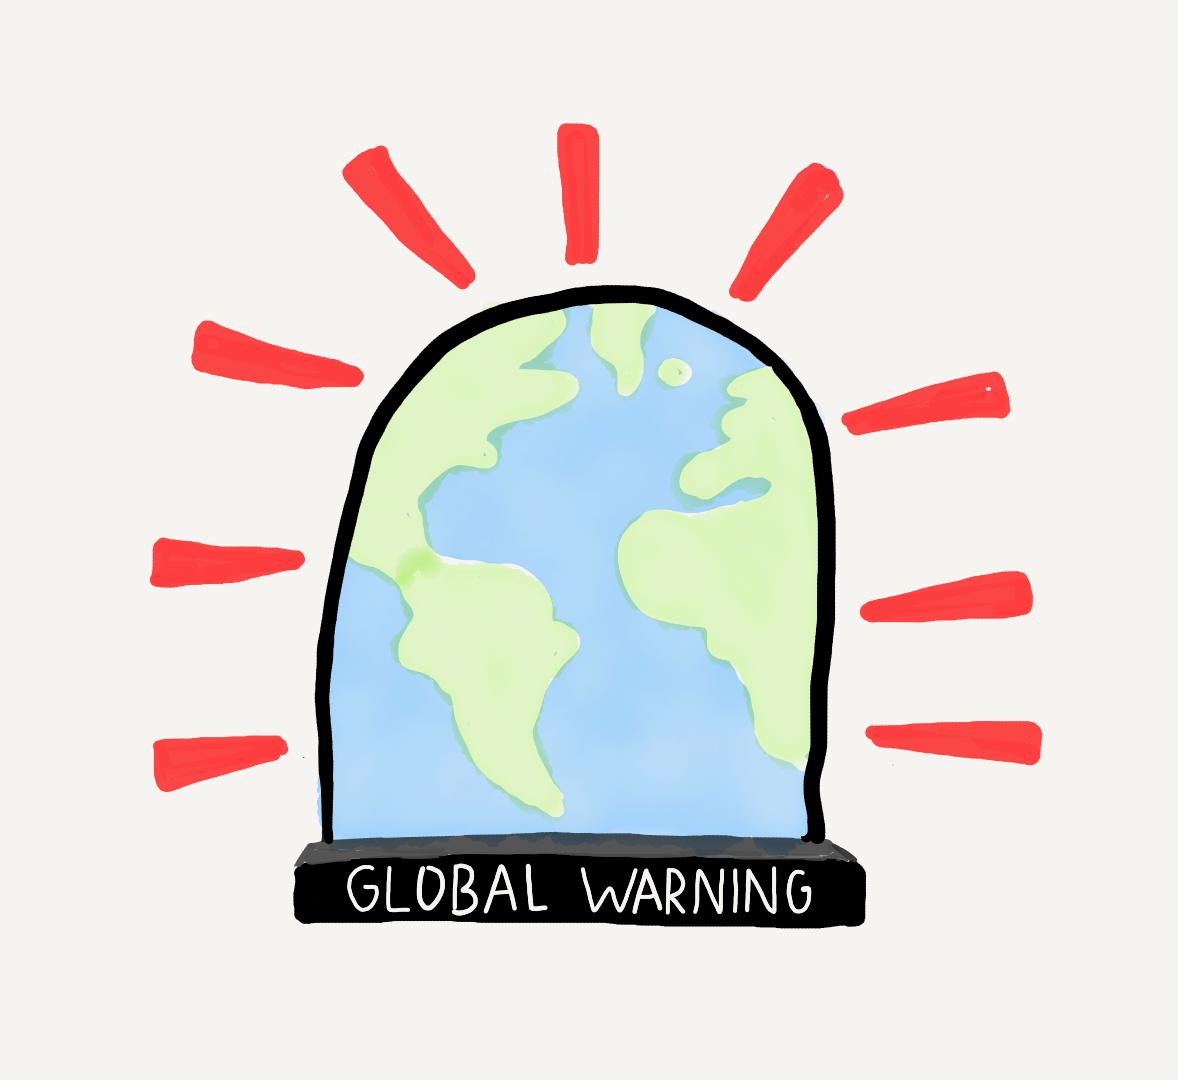 Global Warning.